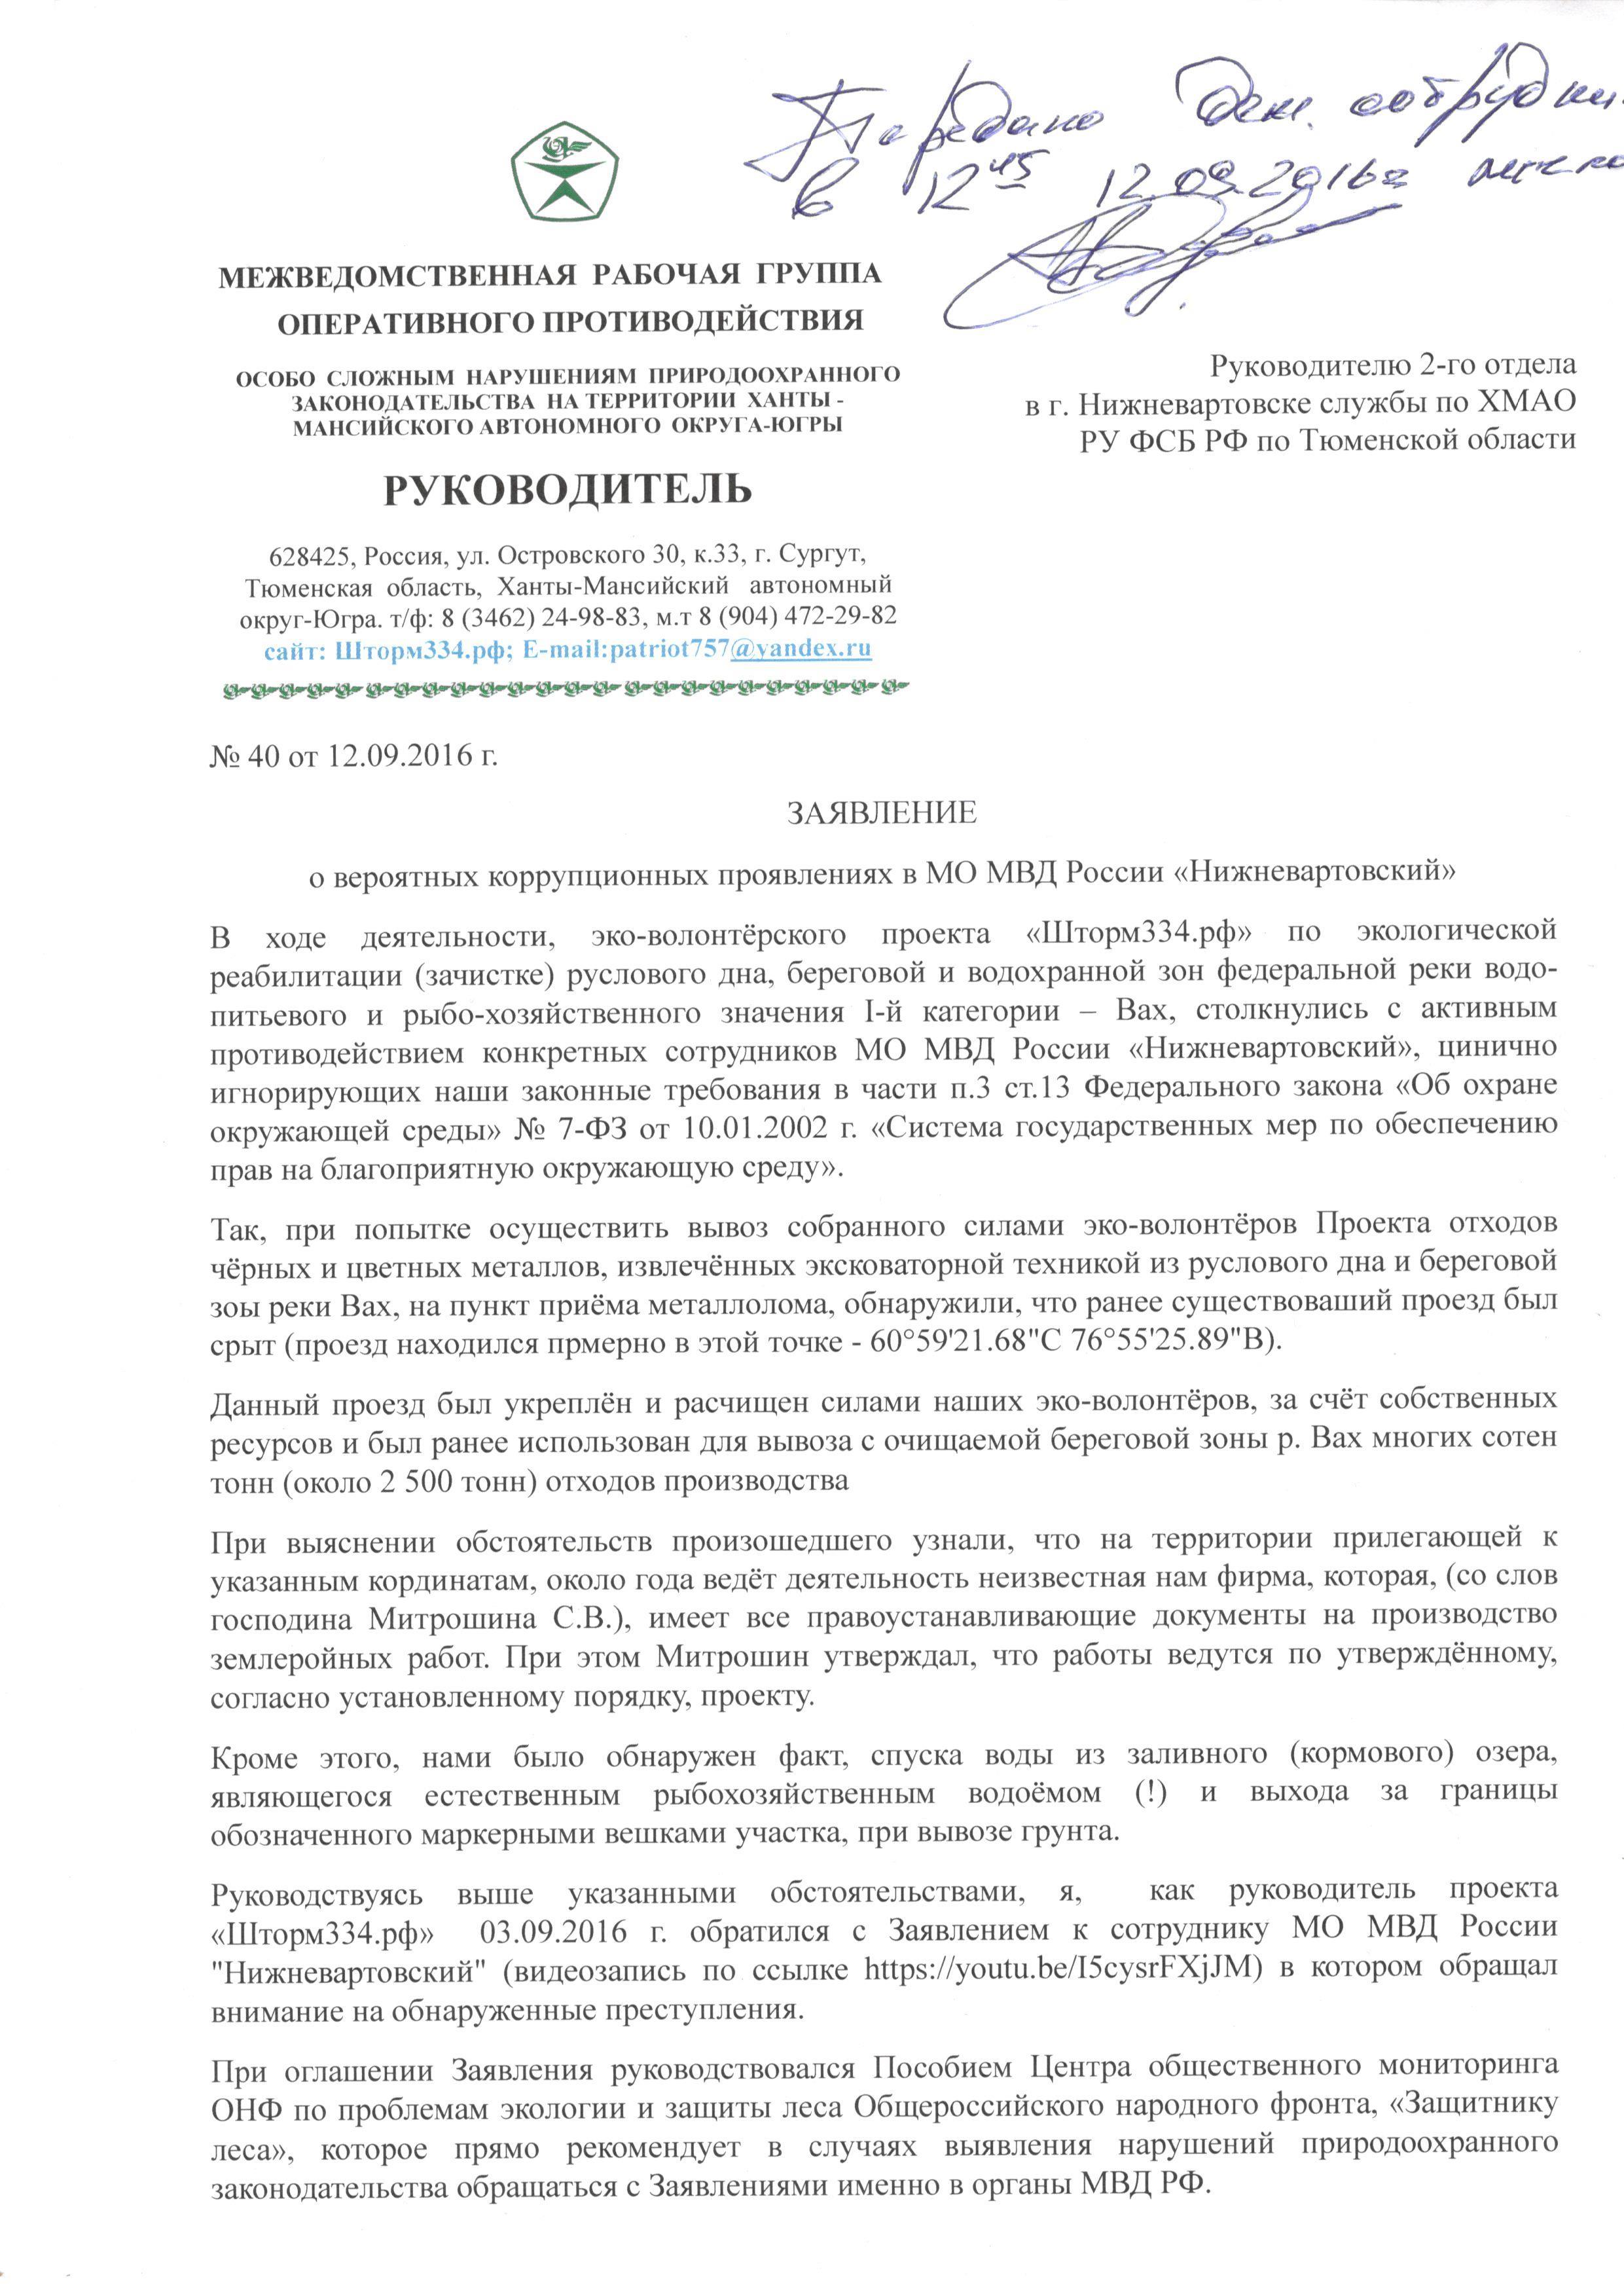 ФСБ-20001